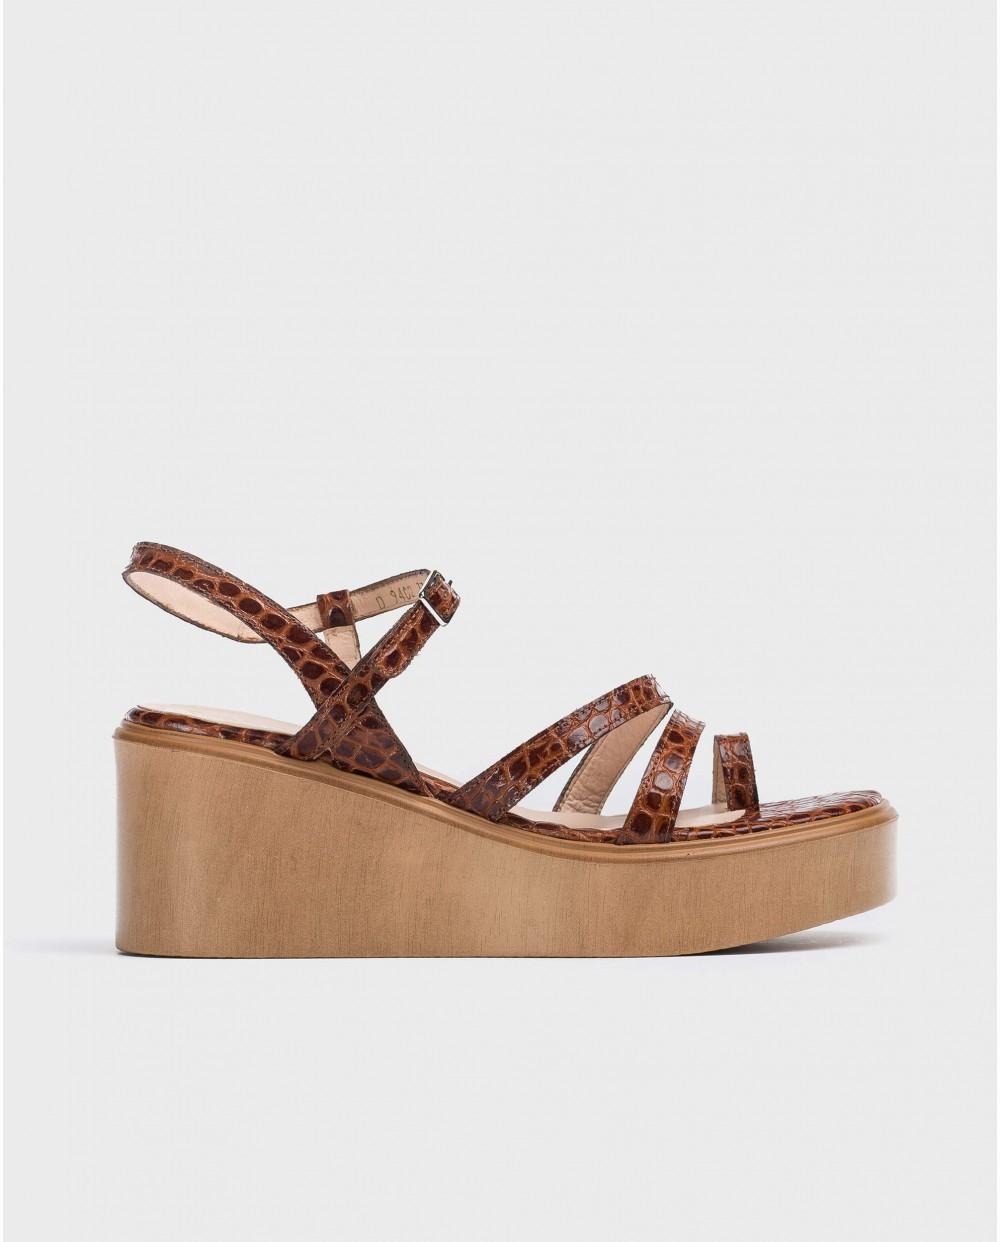 Wonders-Women-Platform sandal with toe post